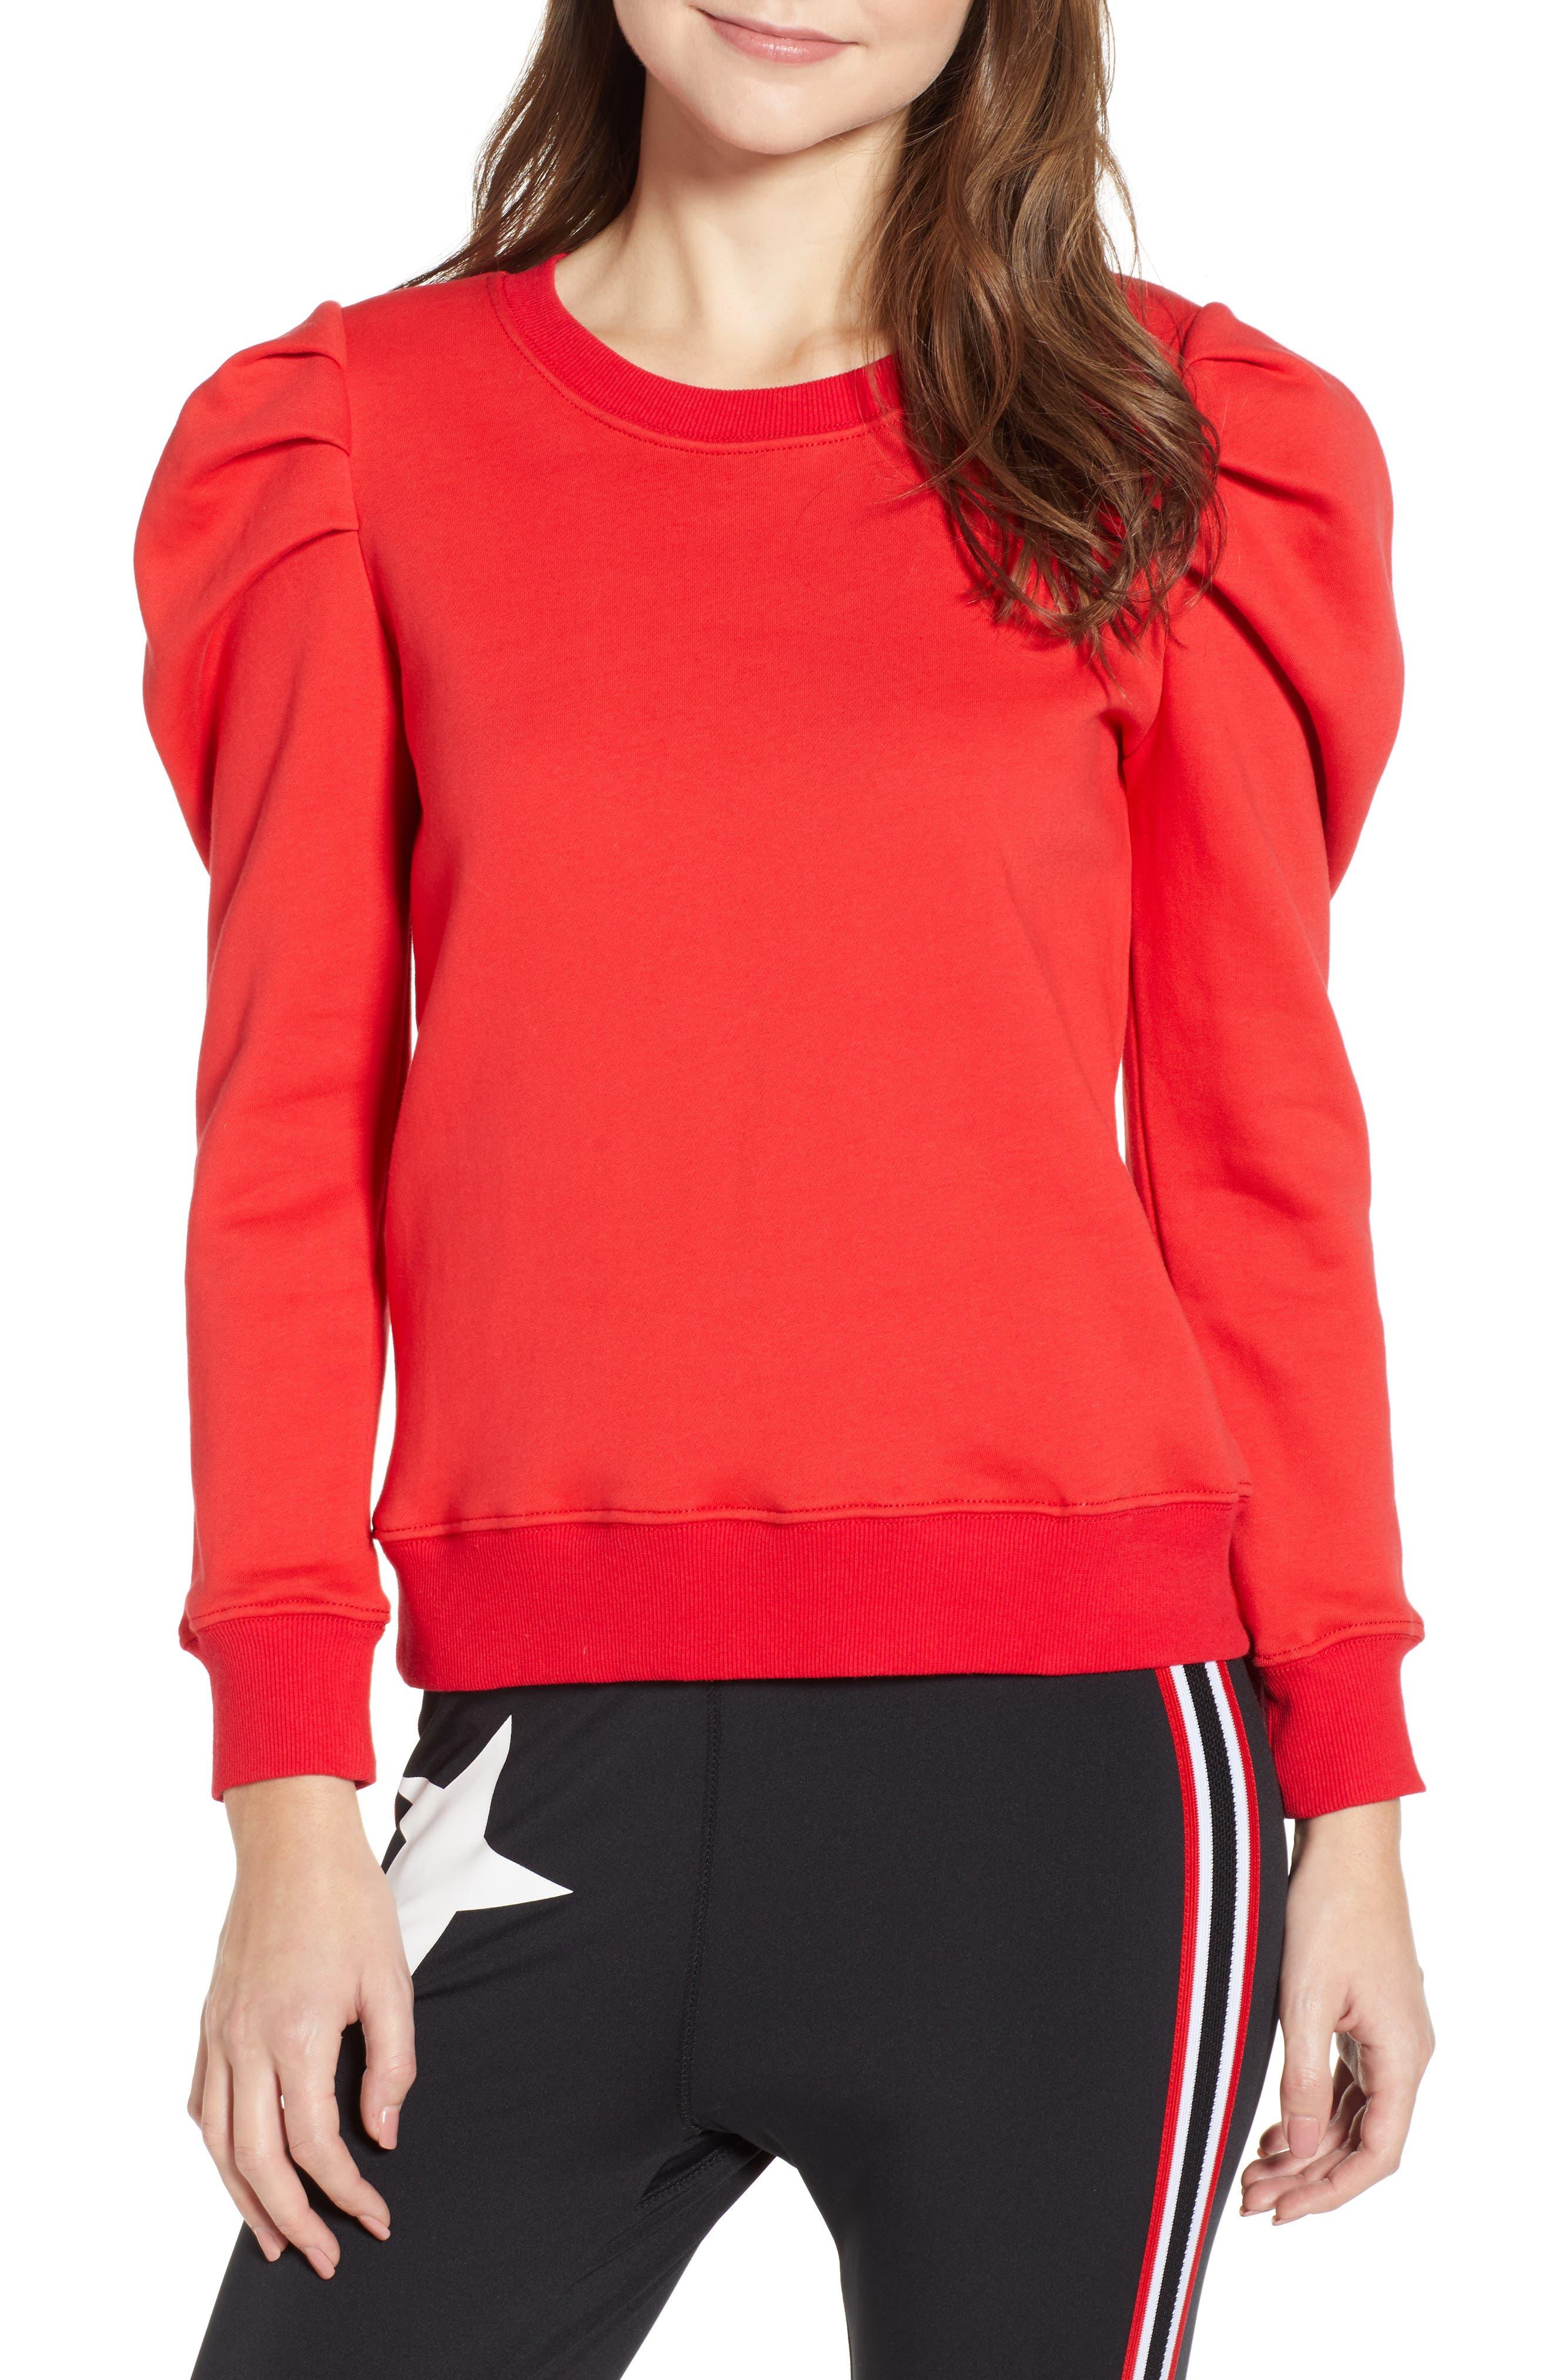 PAM & GELA Puff Sleeve Sweatshirt, Main, color, 600